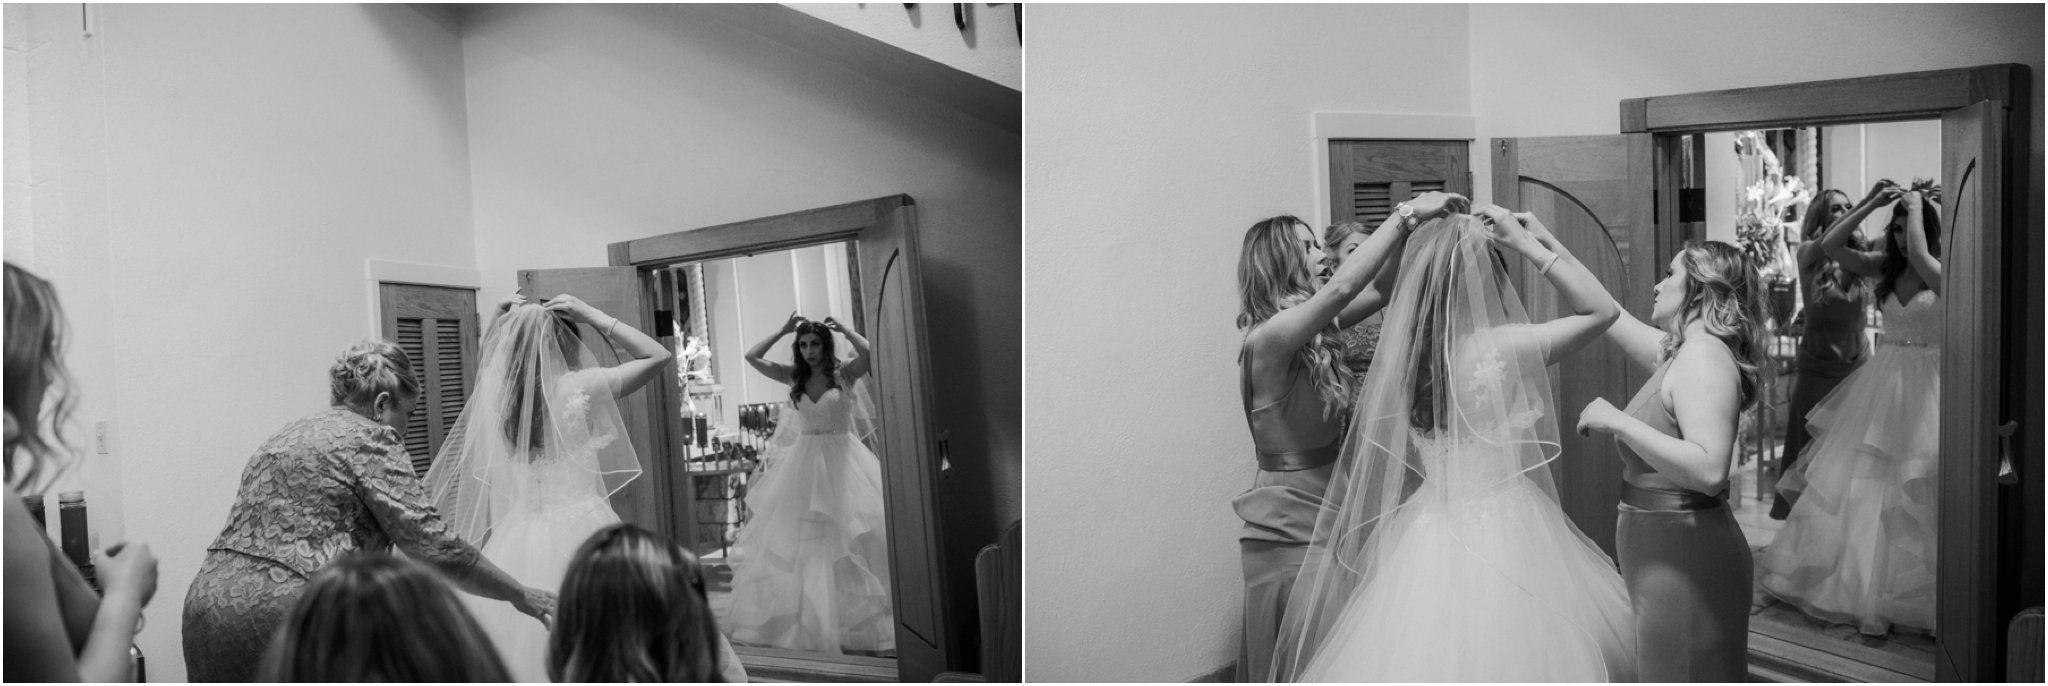 07Blue Rose Photography_ Albuquerque_ Santa Fe_ New Mexico wedding photographers